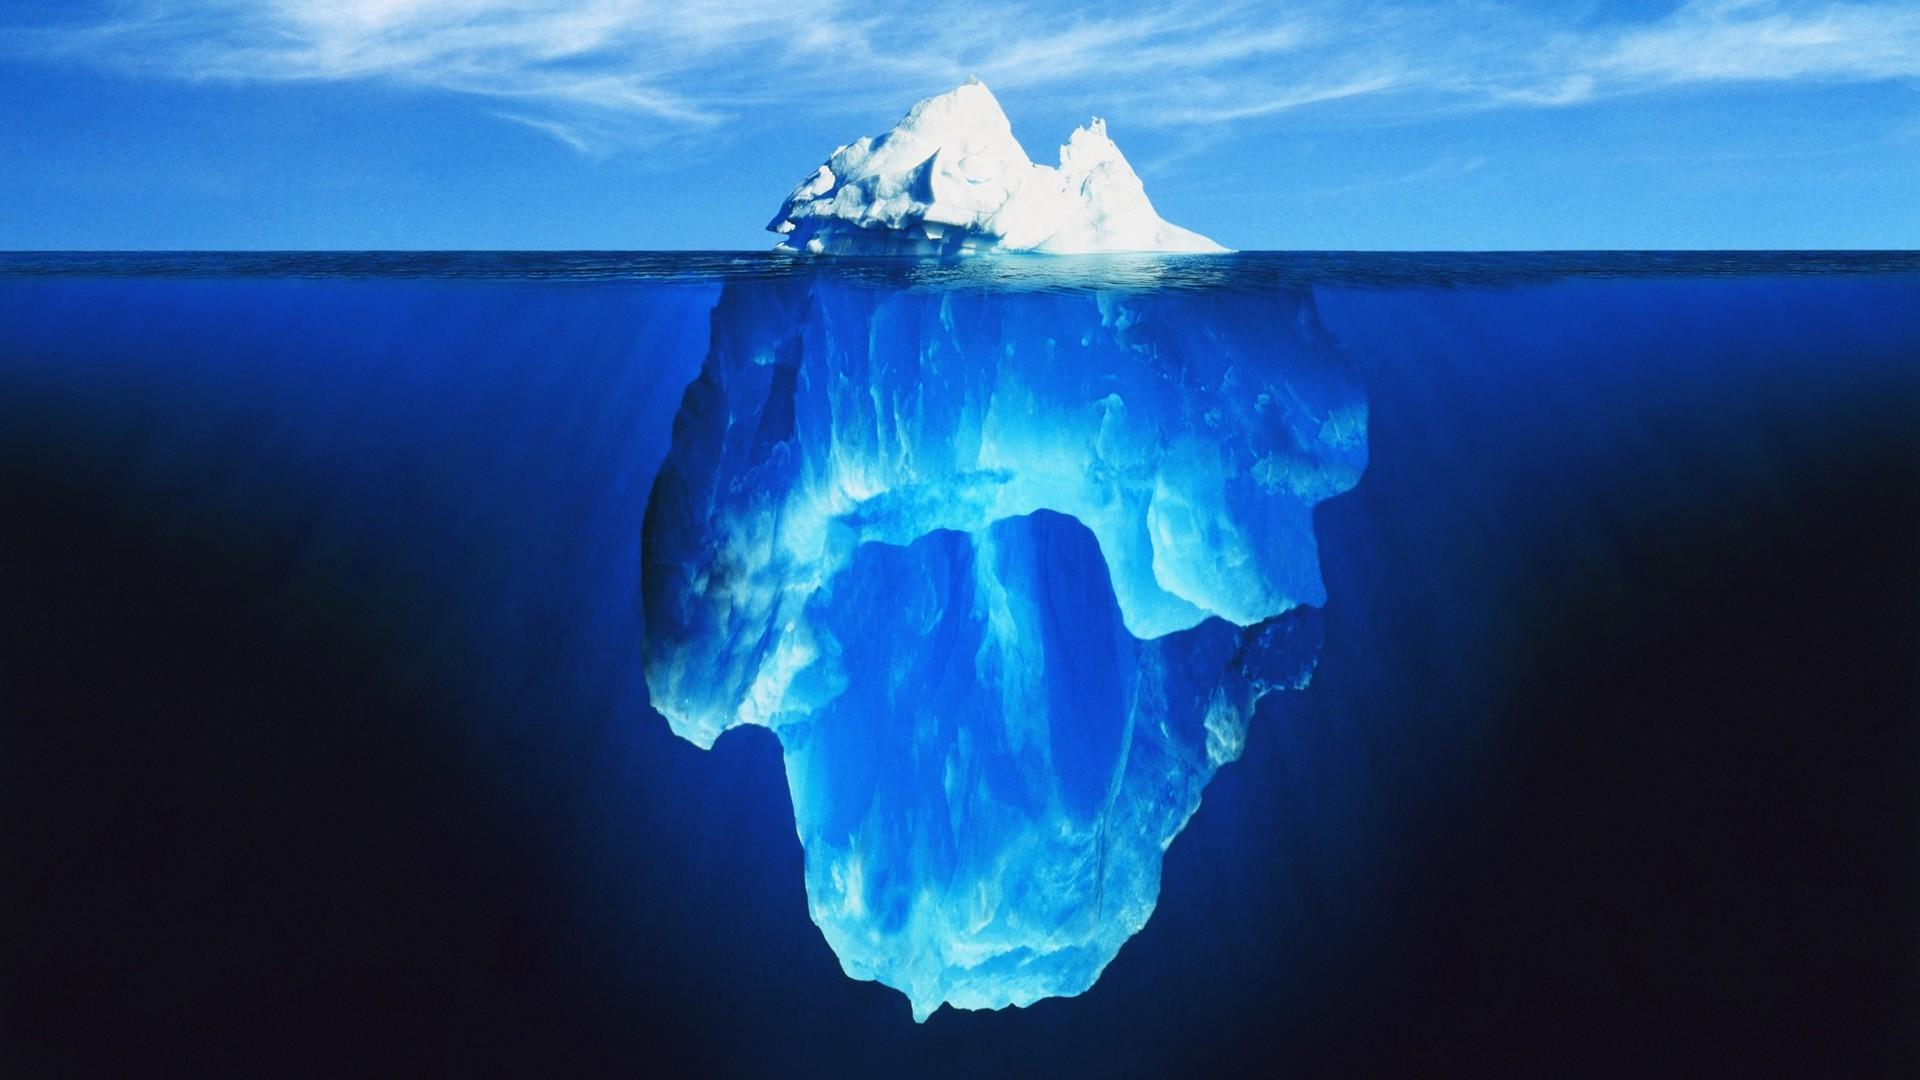 Nice wallpapers Iceberg 1920x1080px